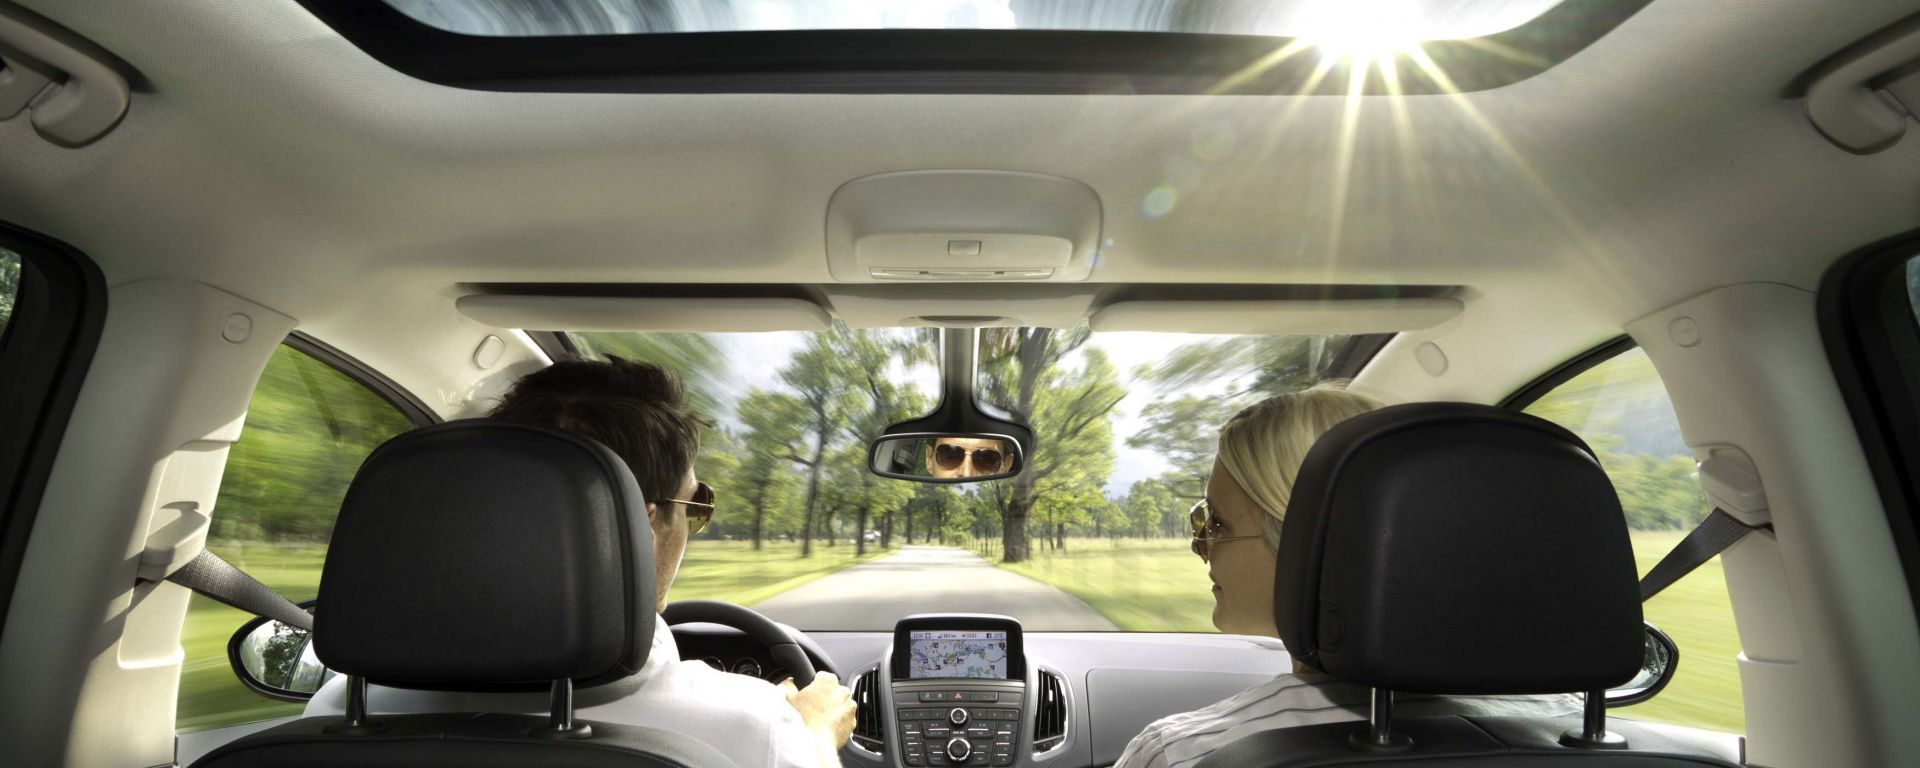 Opel Zafira Tourer: 70 nuove immagini in HD